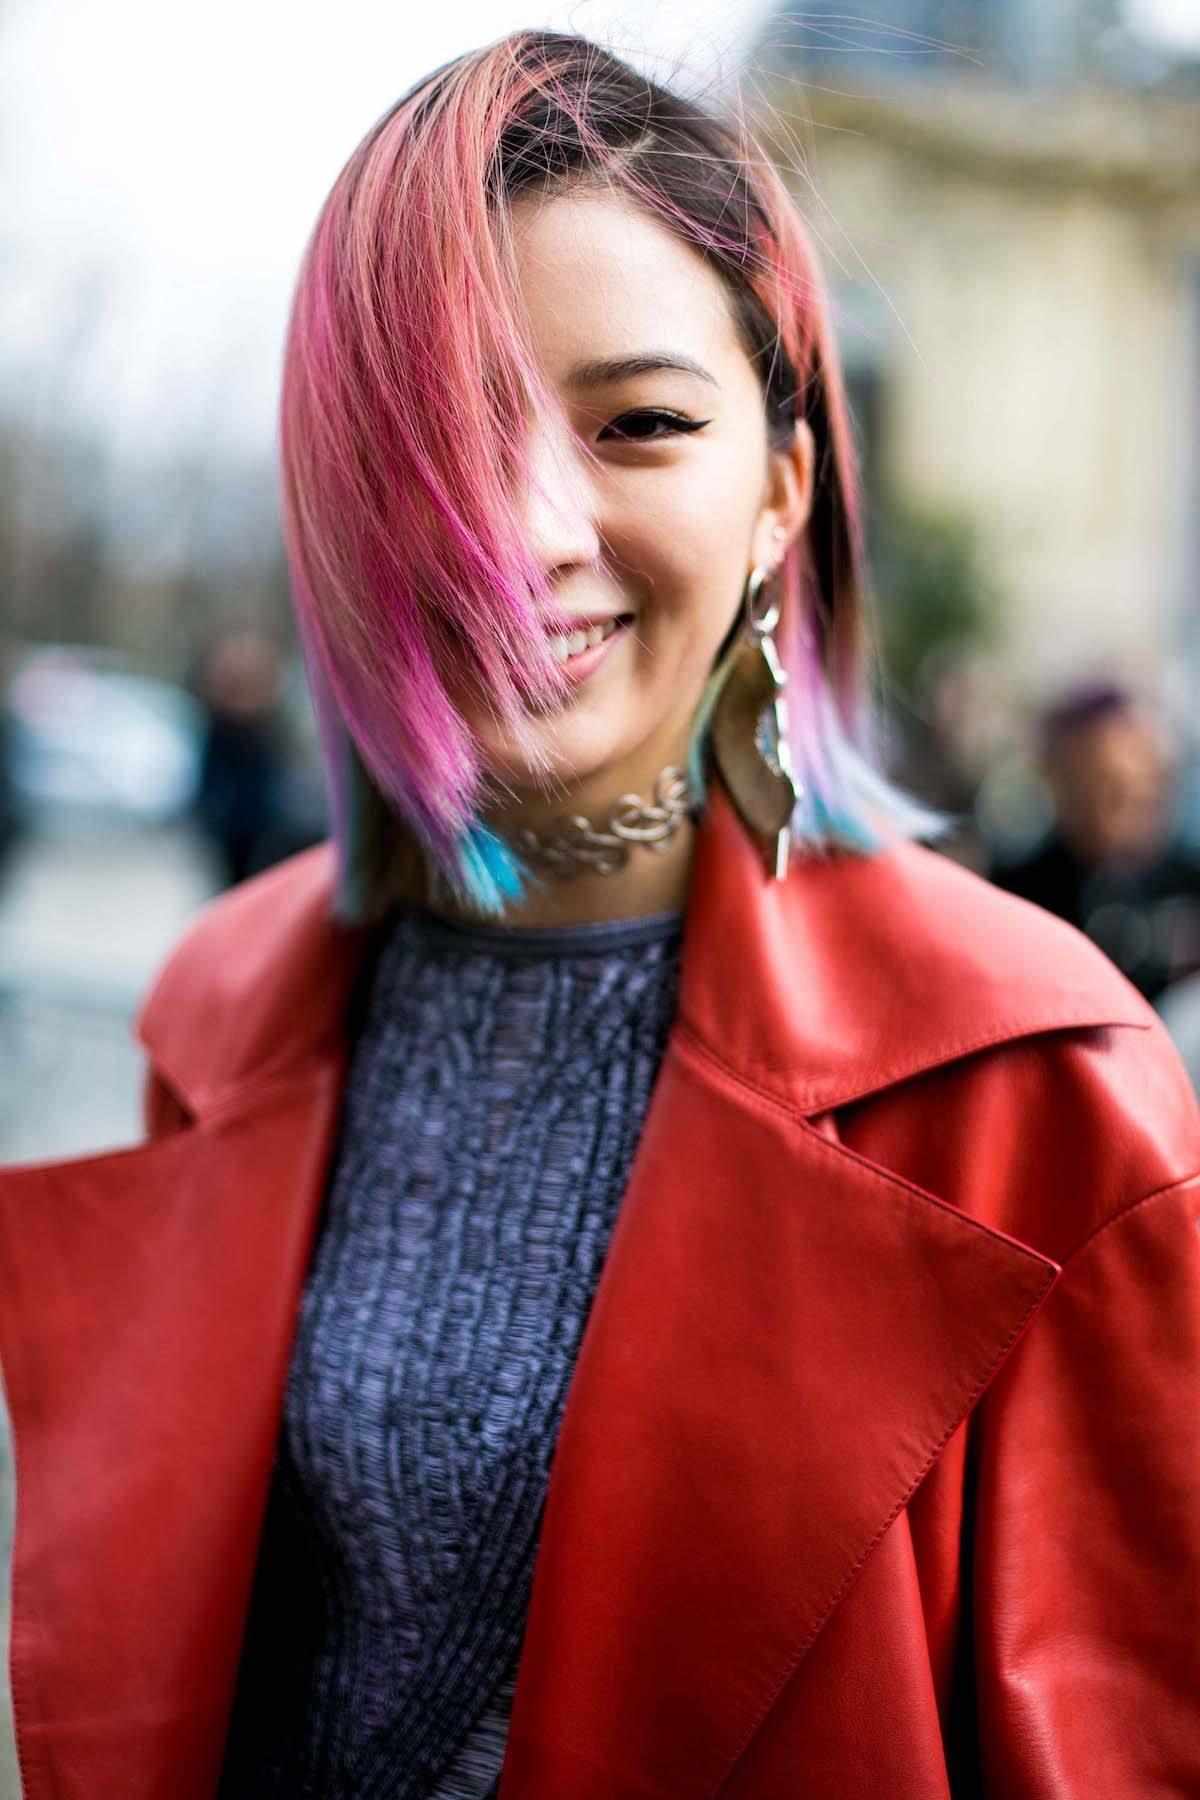 Gaya Rambut Pendek Wanita Berwajah Bulat